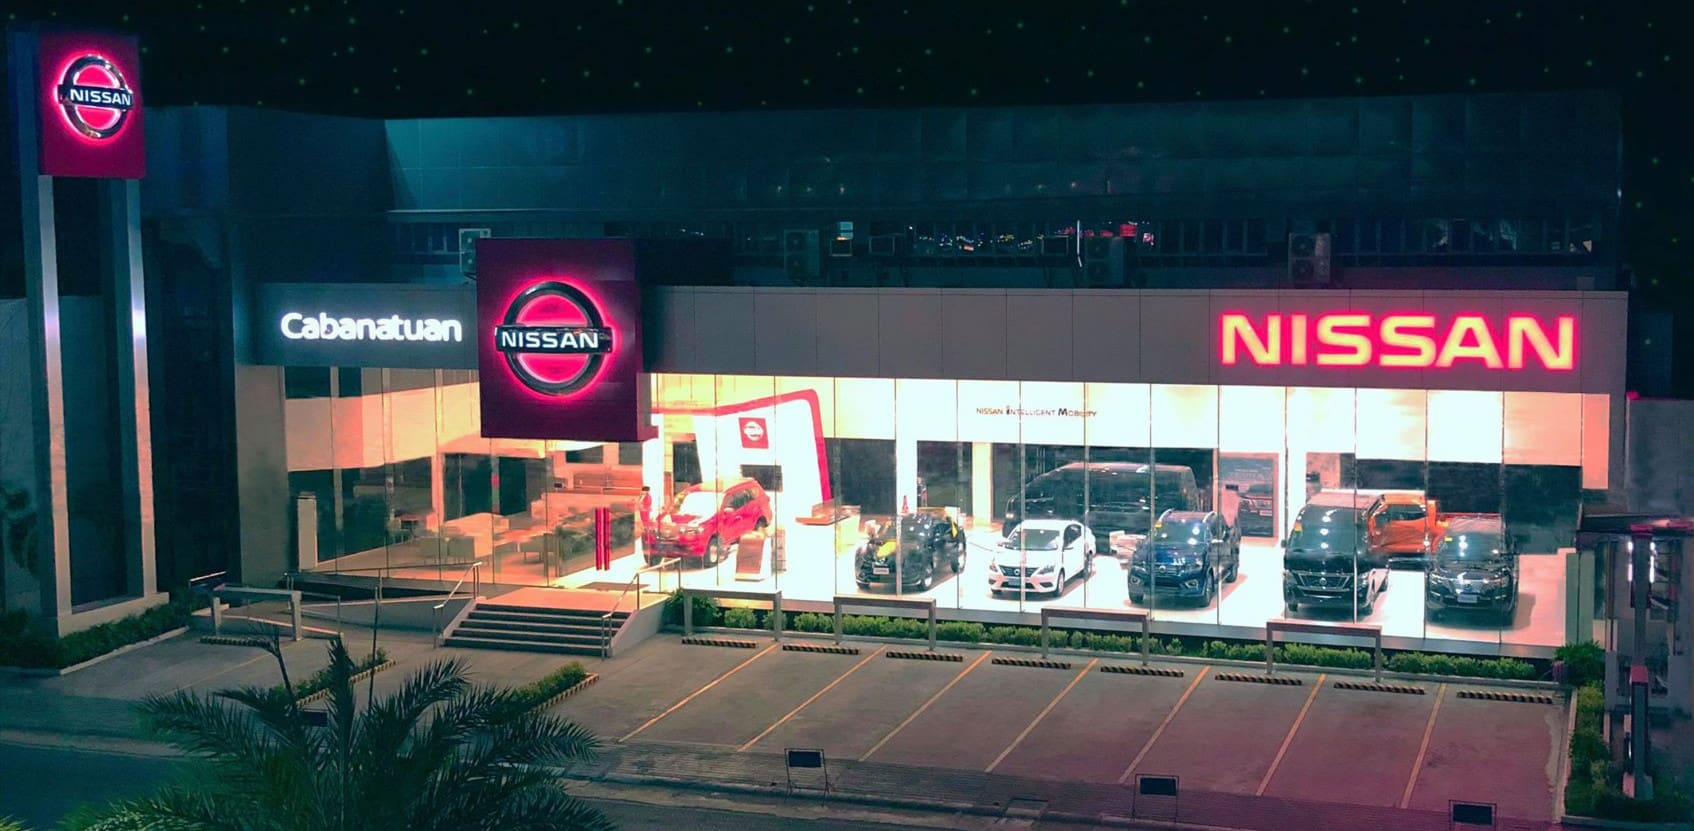 Nissan Cabanatuan Shapes Dealership to NRC standards